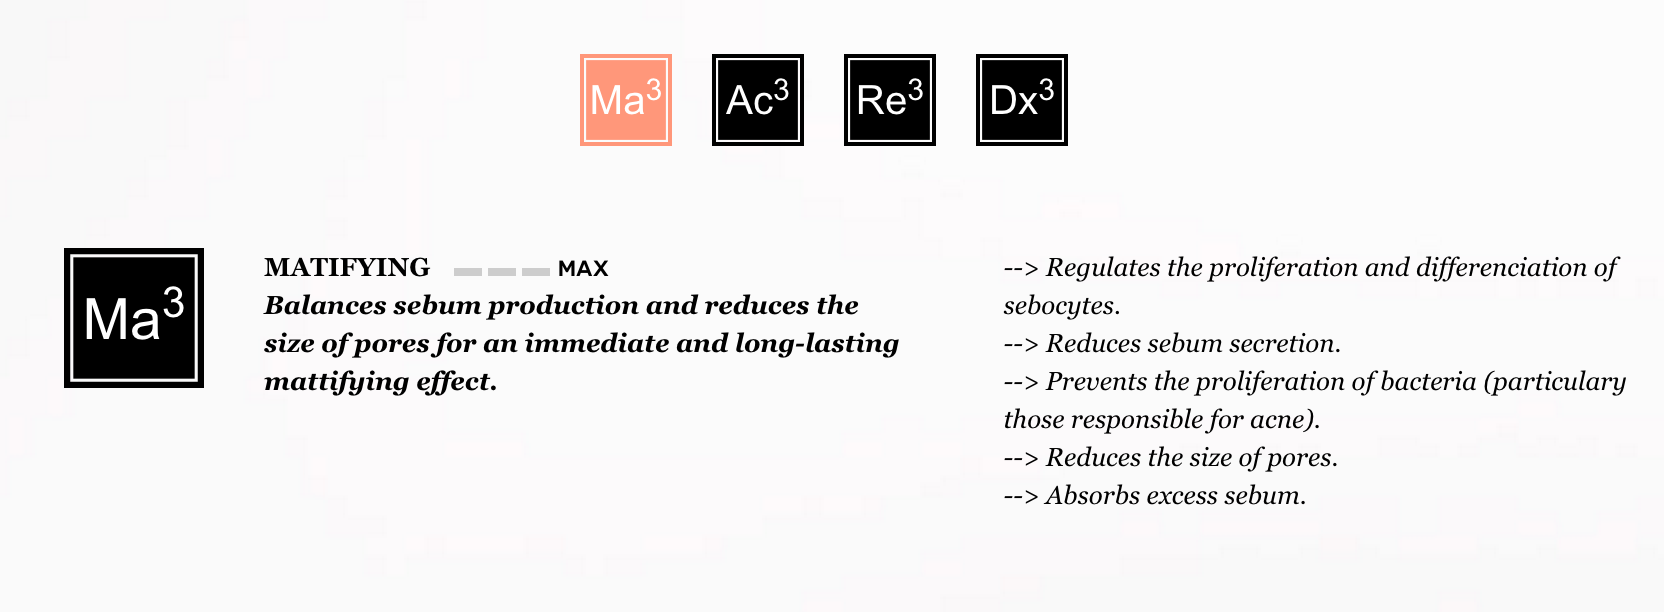 Image Source:https://world.codageparis.com/en/products/serums/serum-n2.html